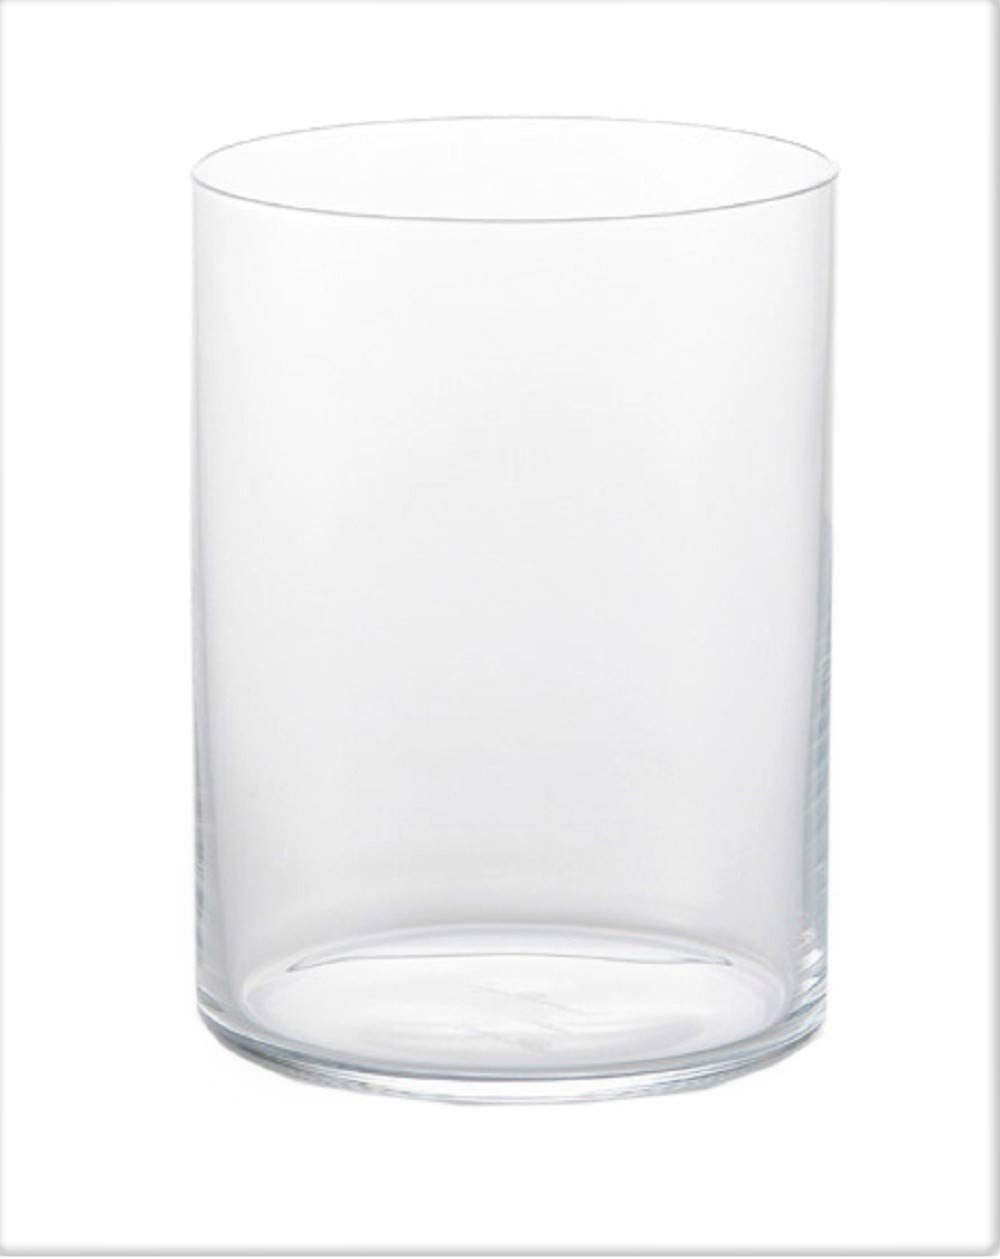 Luigi Bormioli Top Class 12.25 oz All Purpose Drinking Glasses, Set of 6, Clear